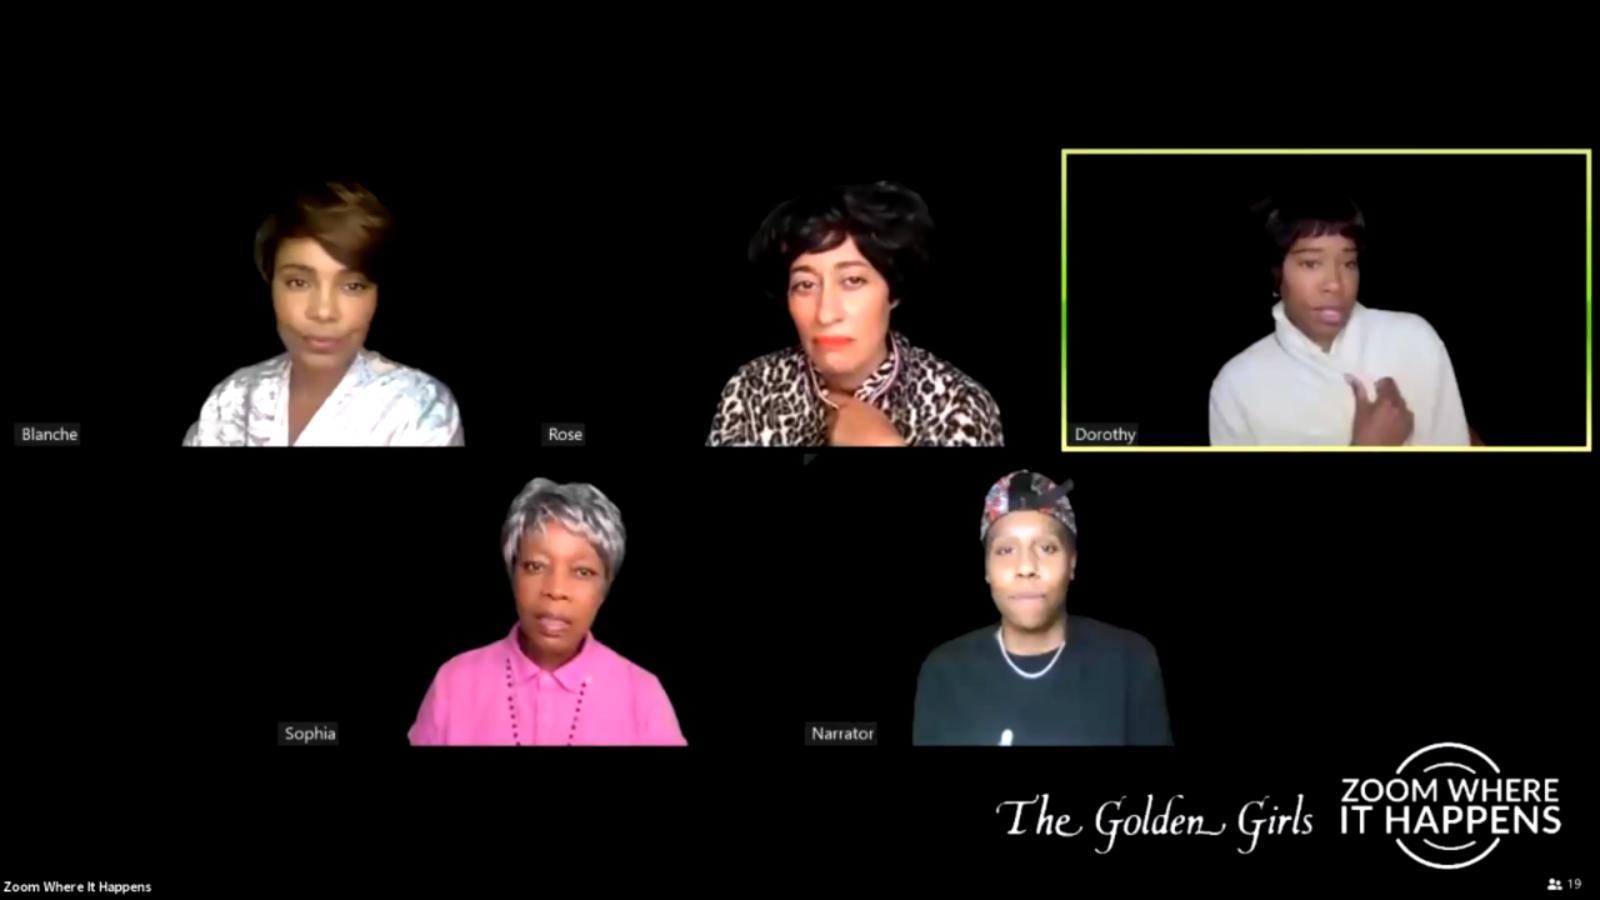 Golden Girls Recast With Black Cast Including Tracee Ellis Ross And Regina King Cnn